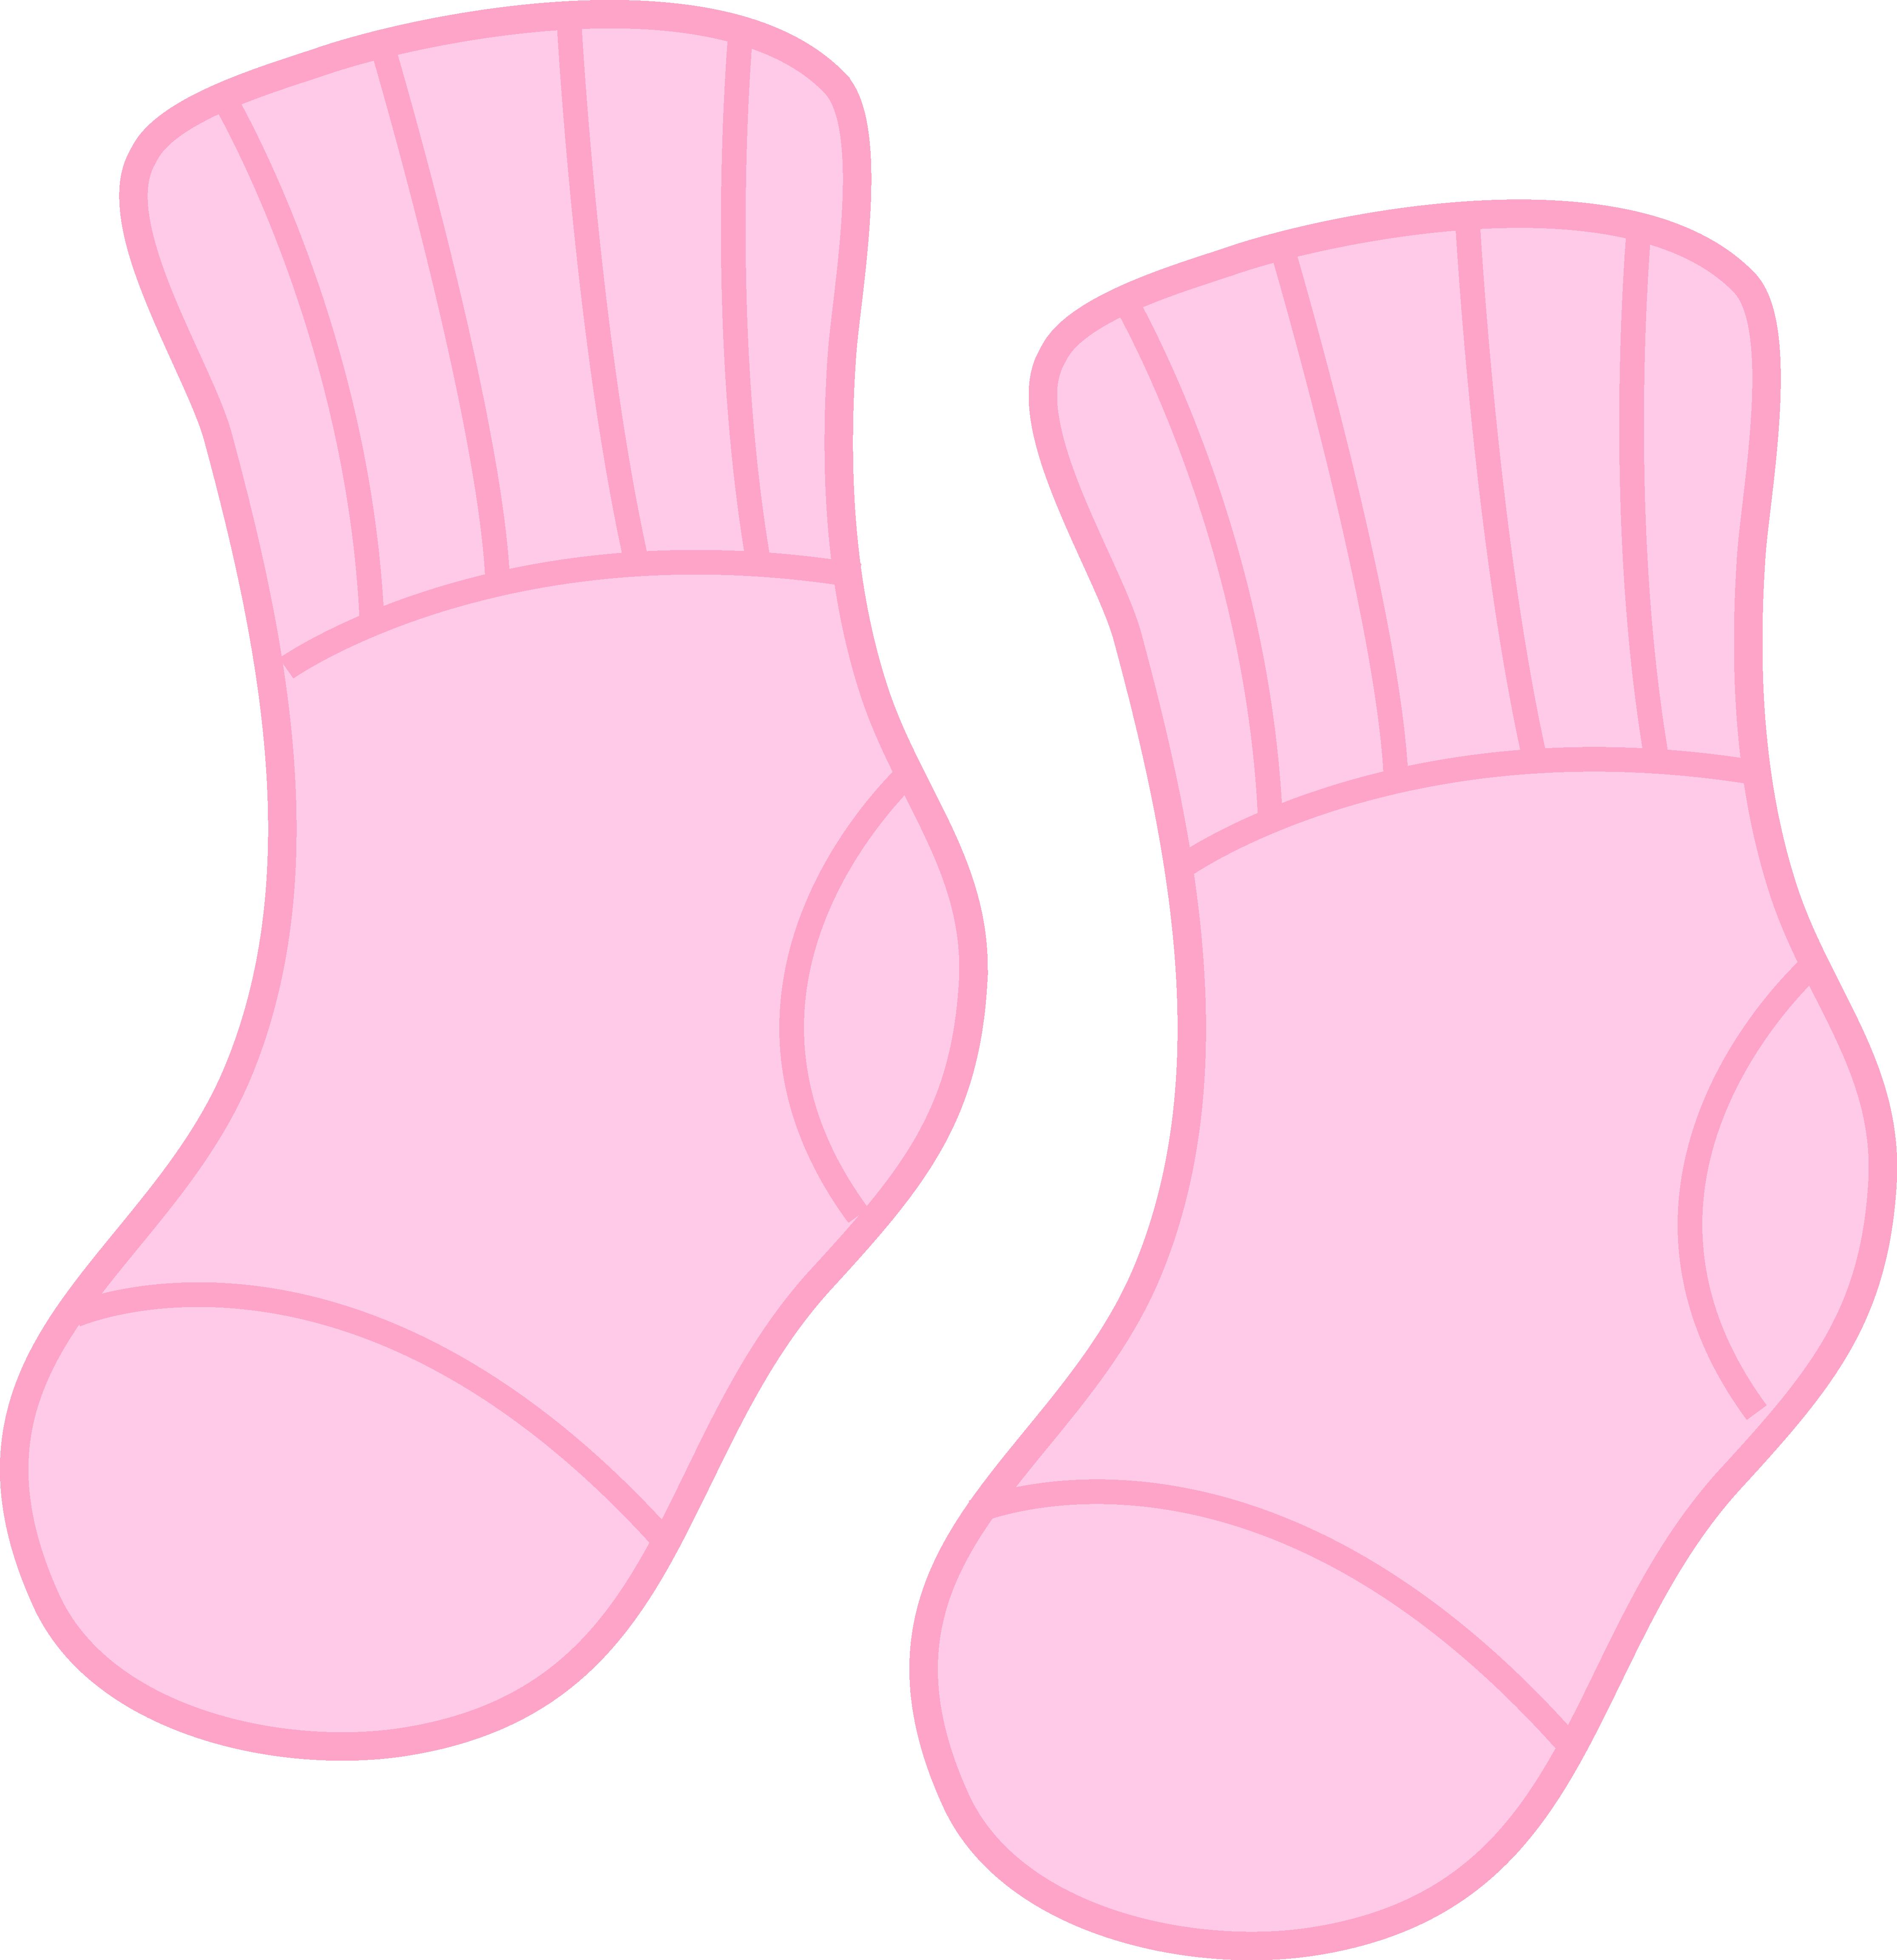 4462x4611 Free Clip Art Baby Feet Borders Clipart Panda